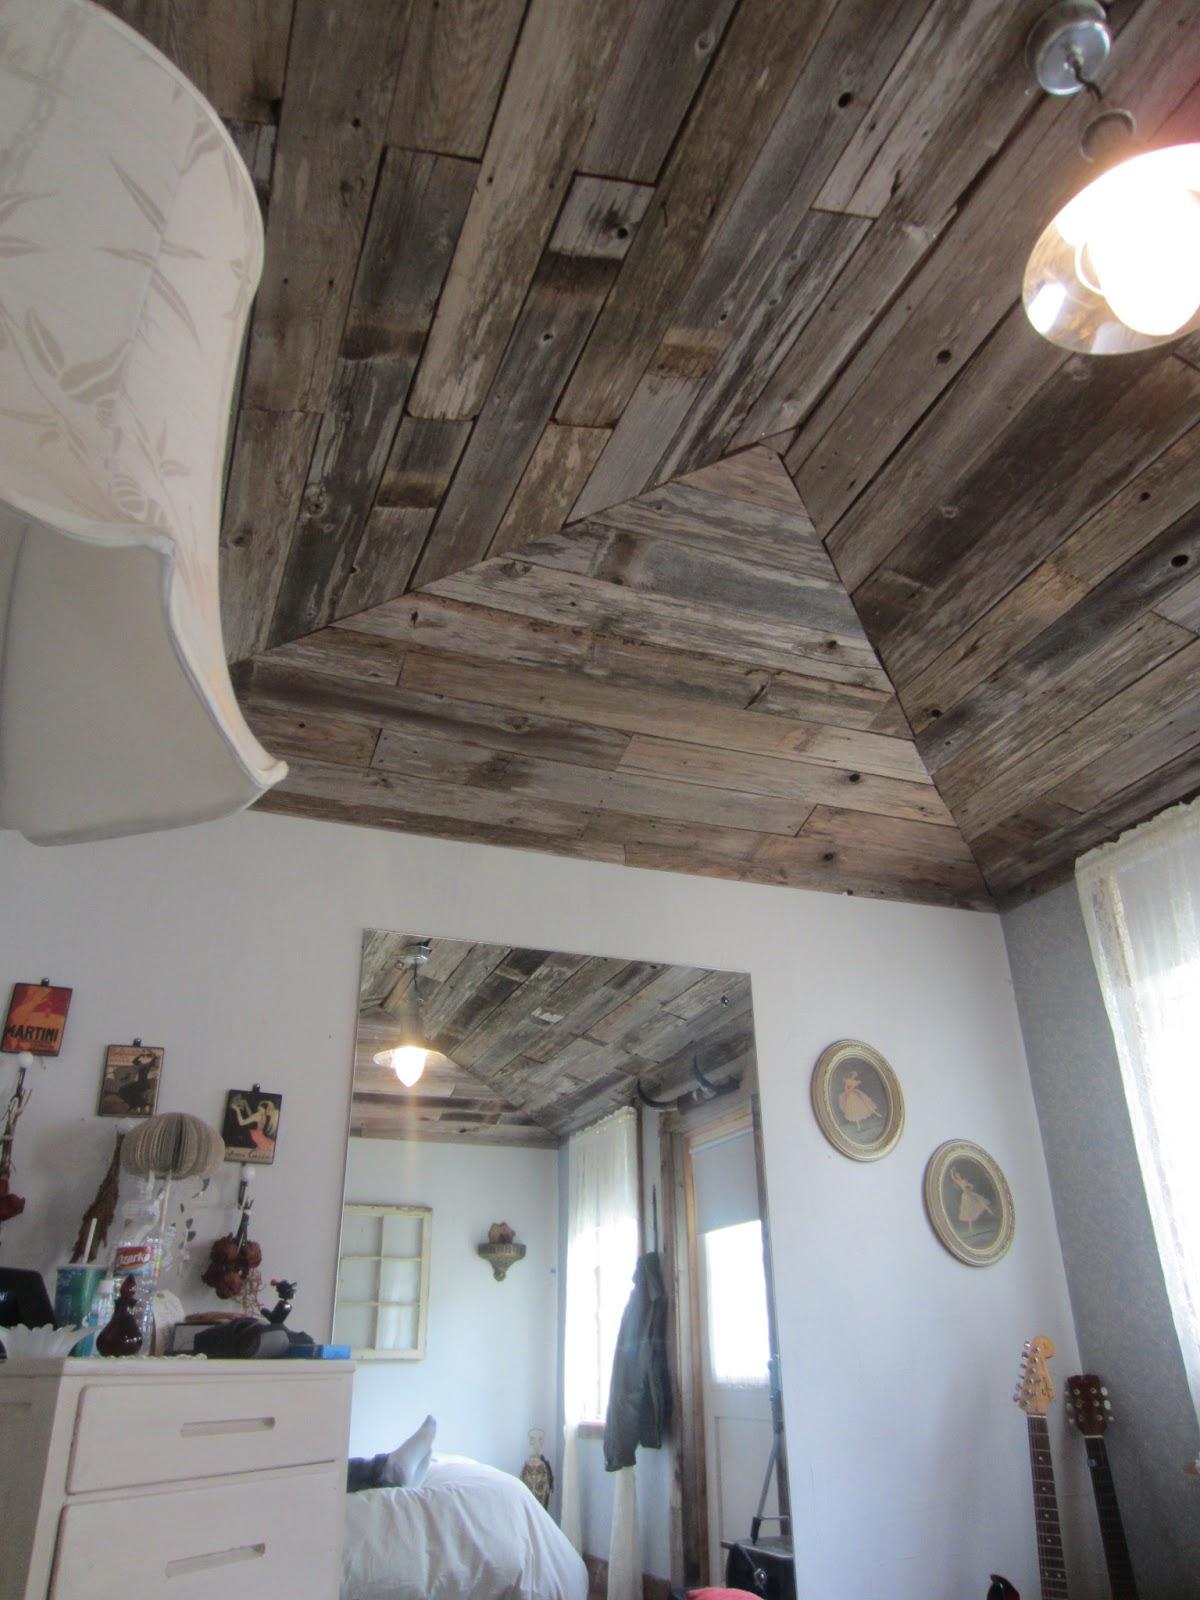 Relaxshacks Barn Board and Fence Lumber Rustic